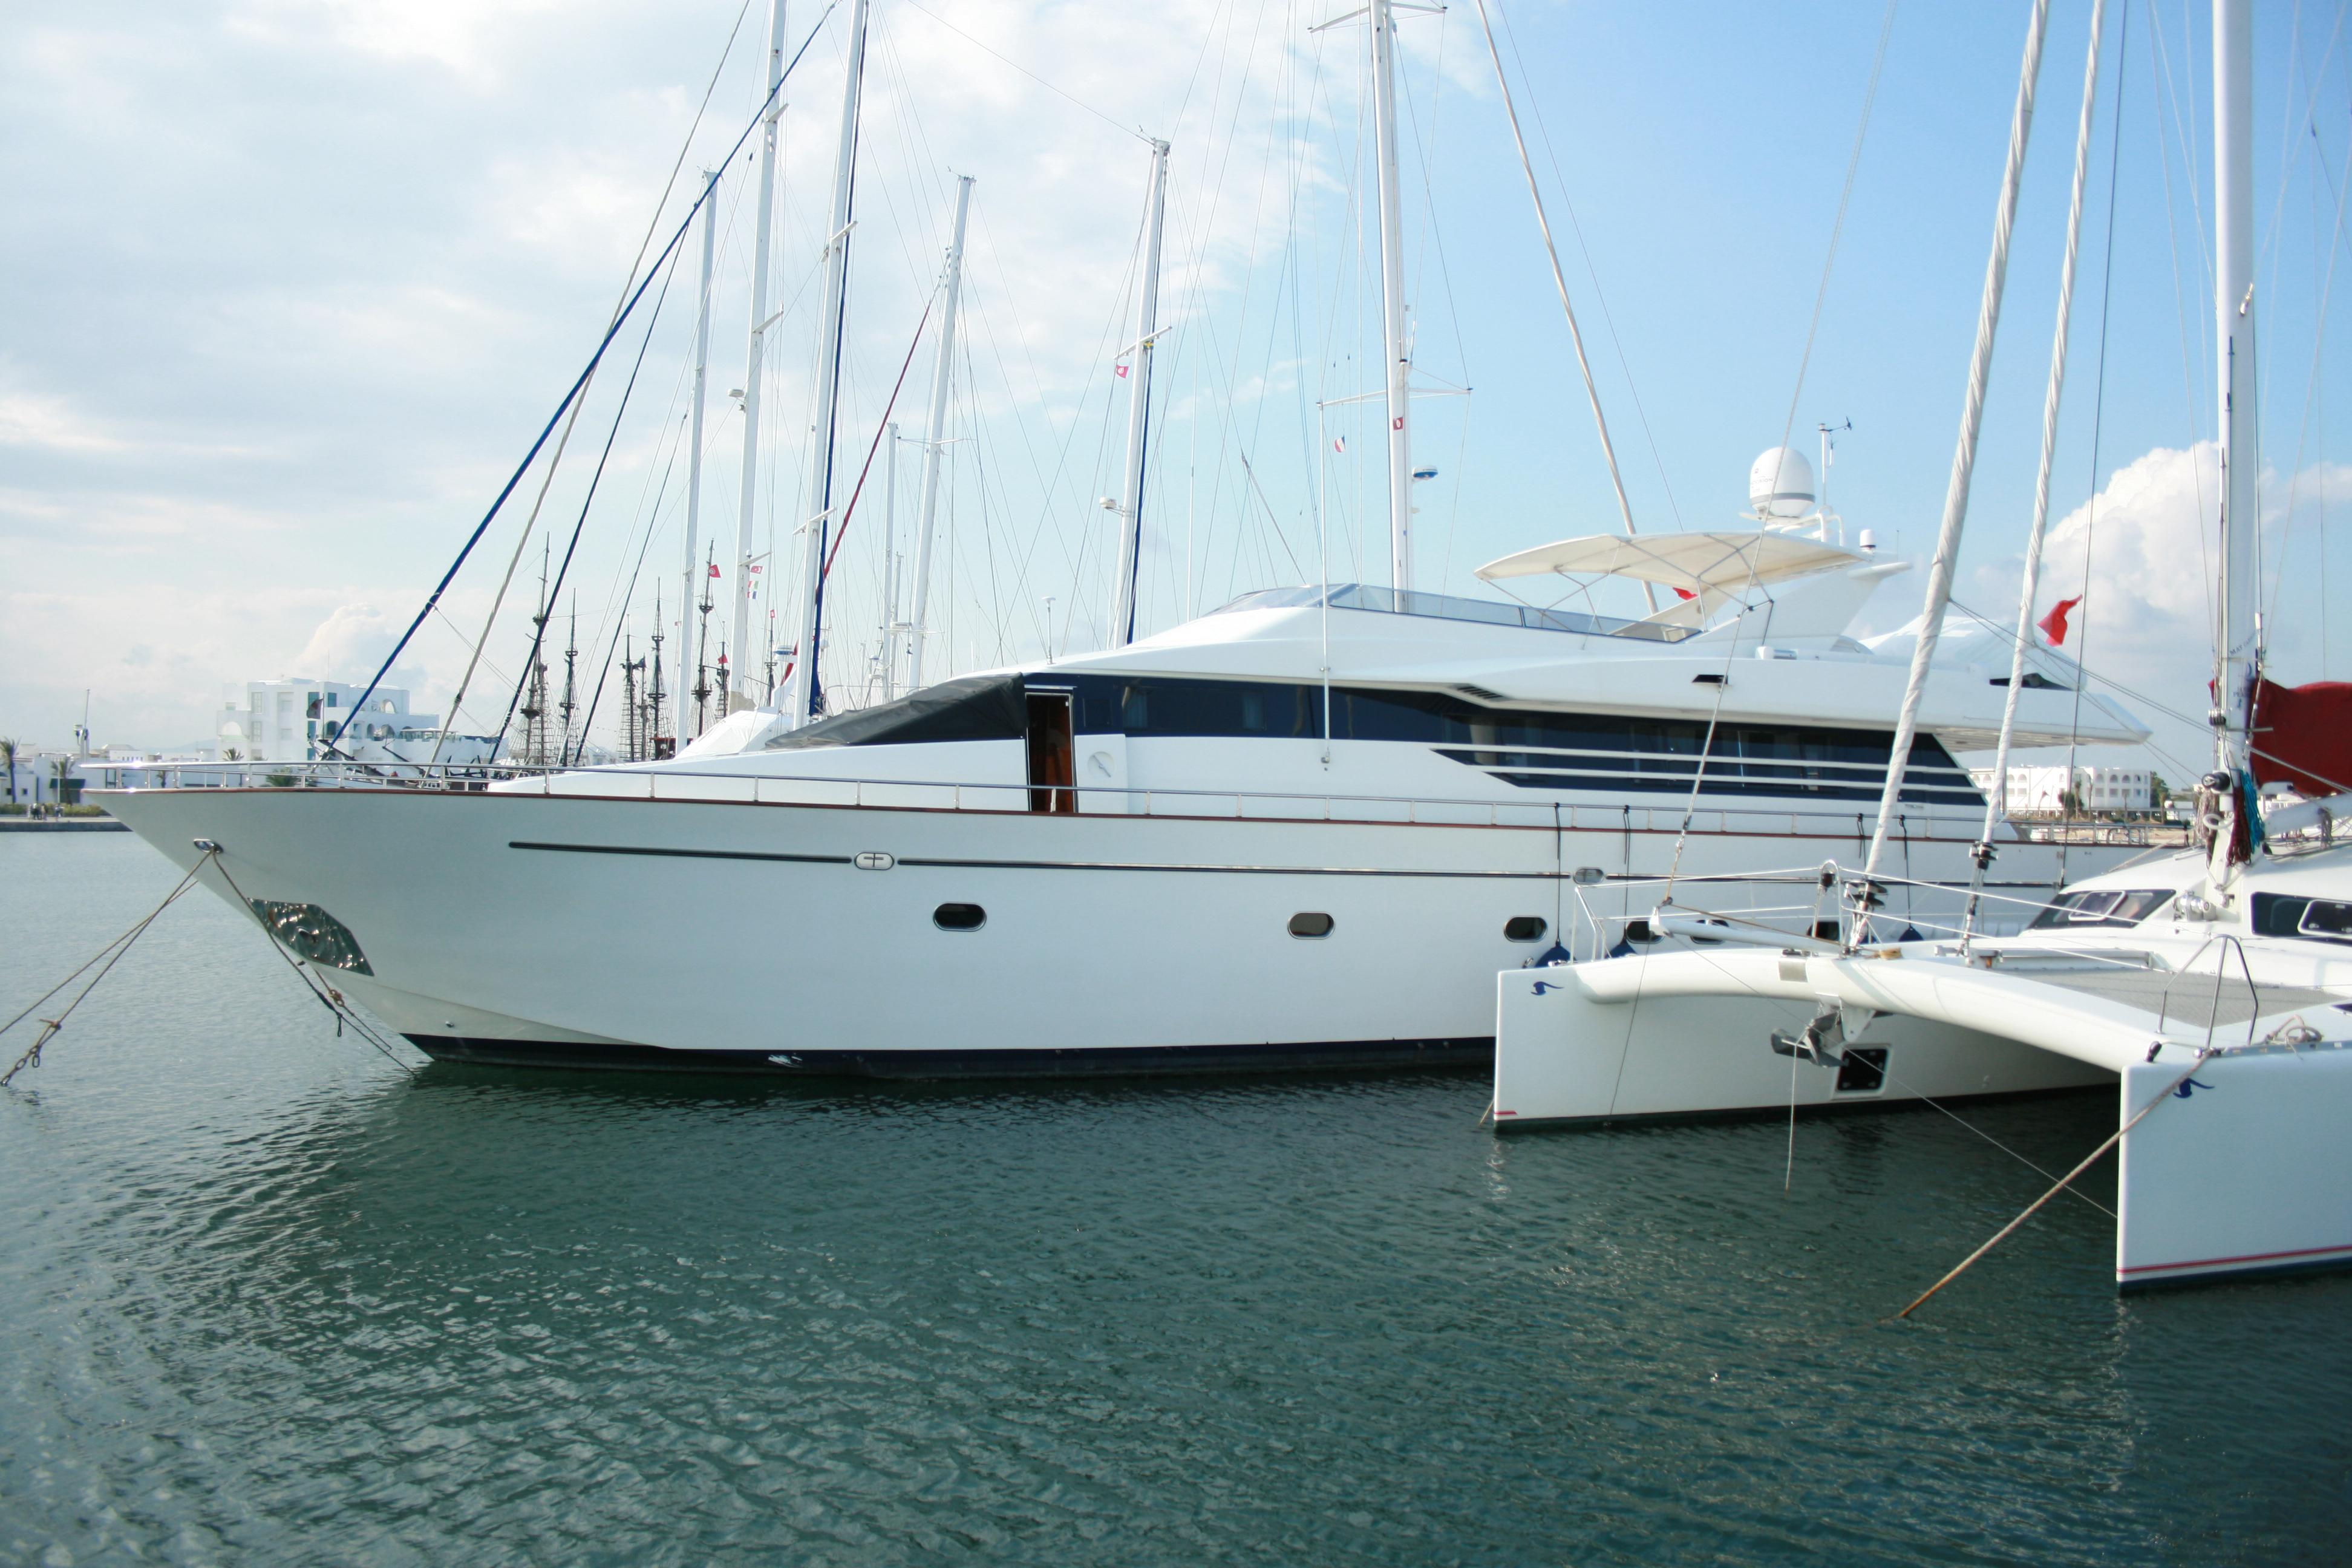 Lotus Hill International Yacht Club